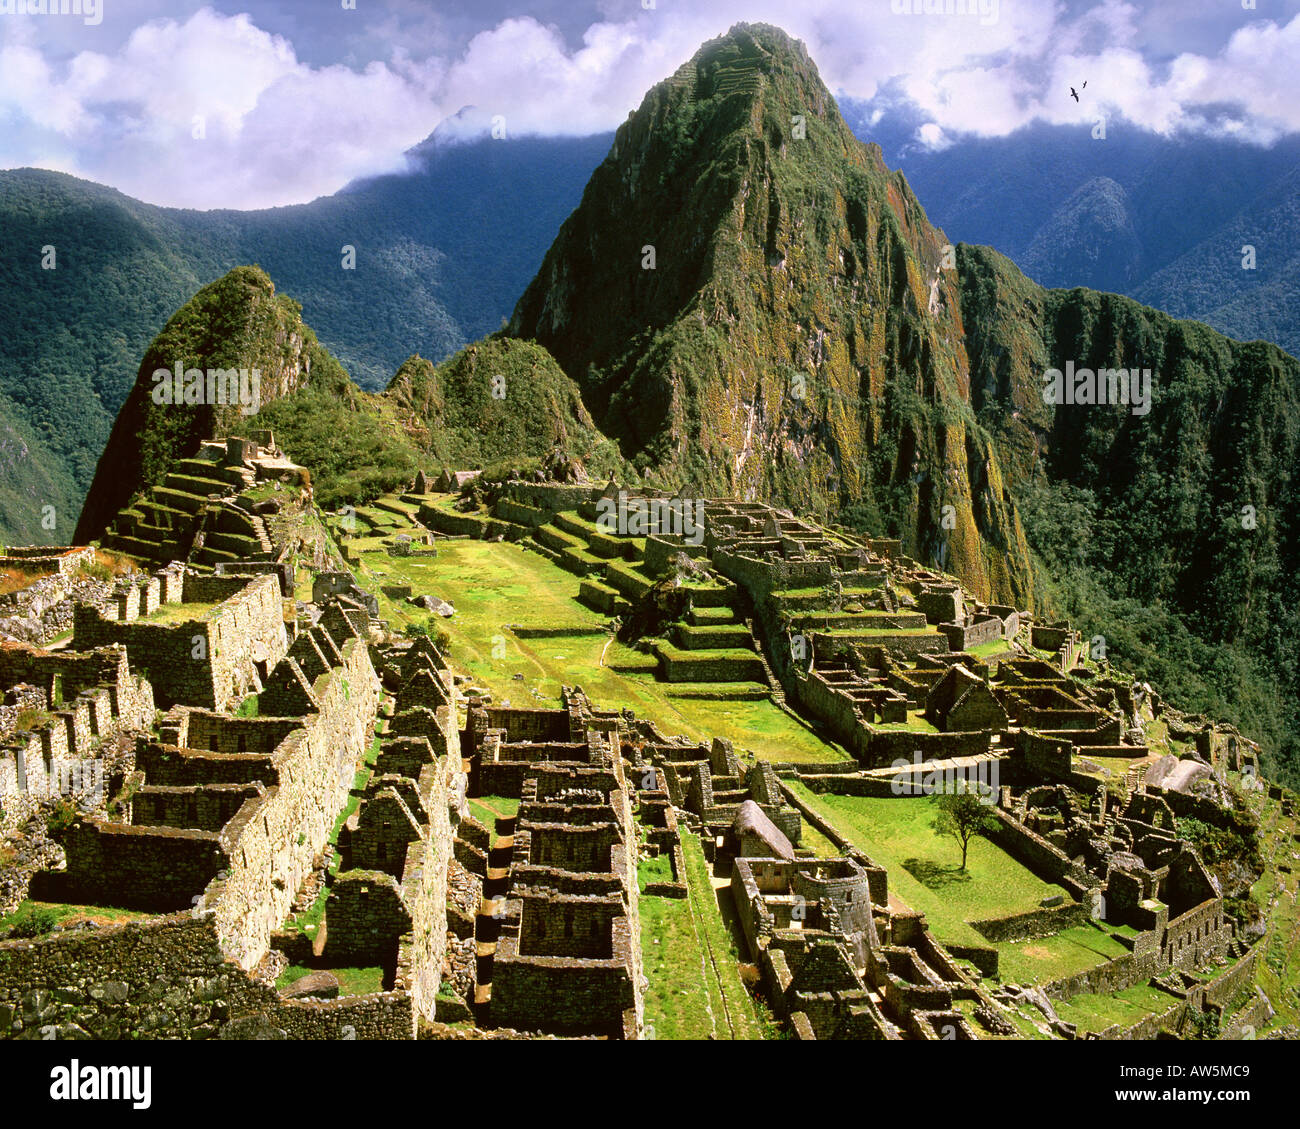 PE - CUZCO: Machu Picchu, die alte Inkastadt in den Anden Stockbild